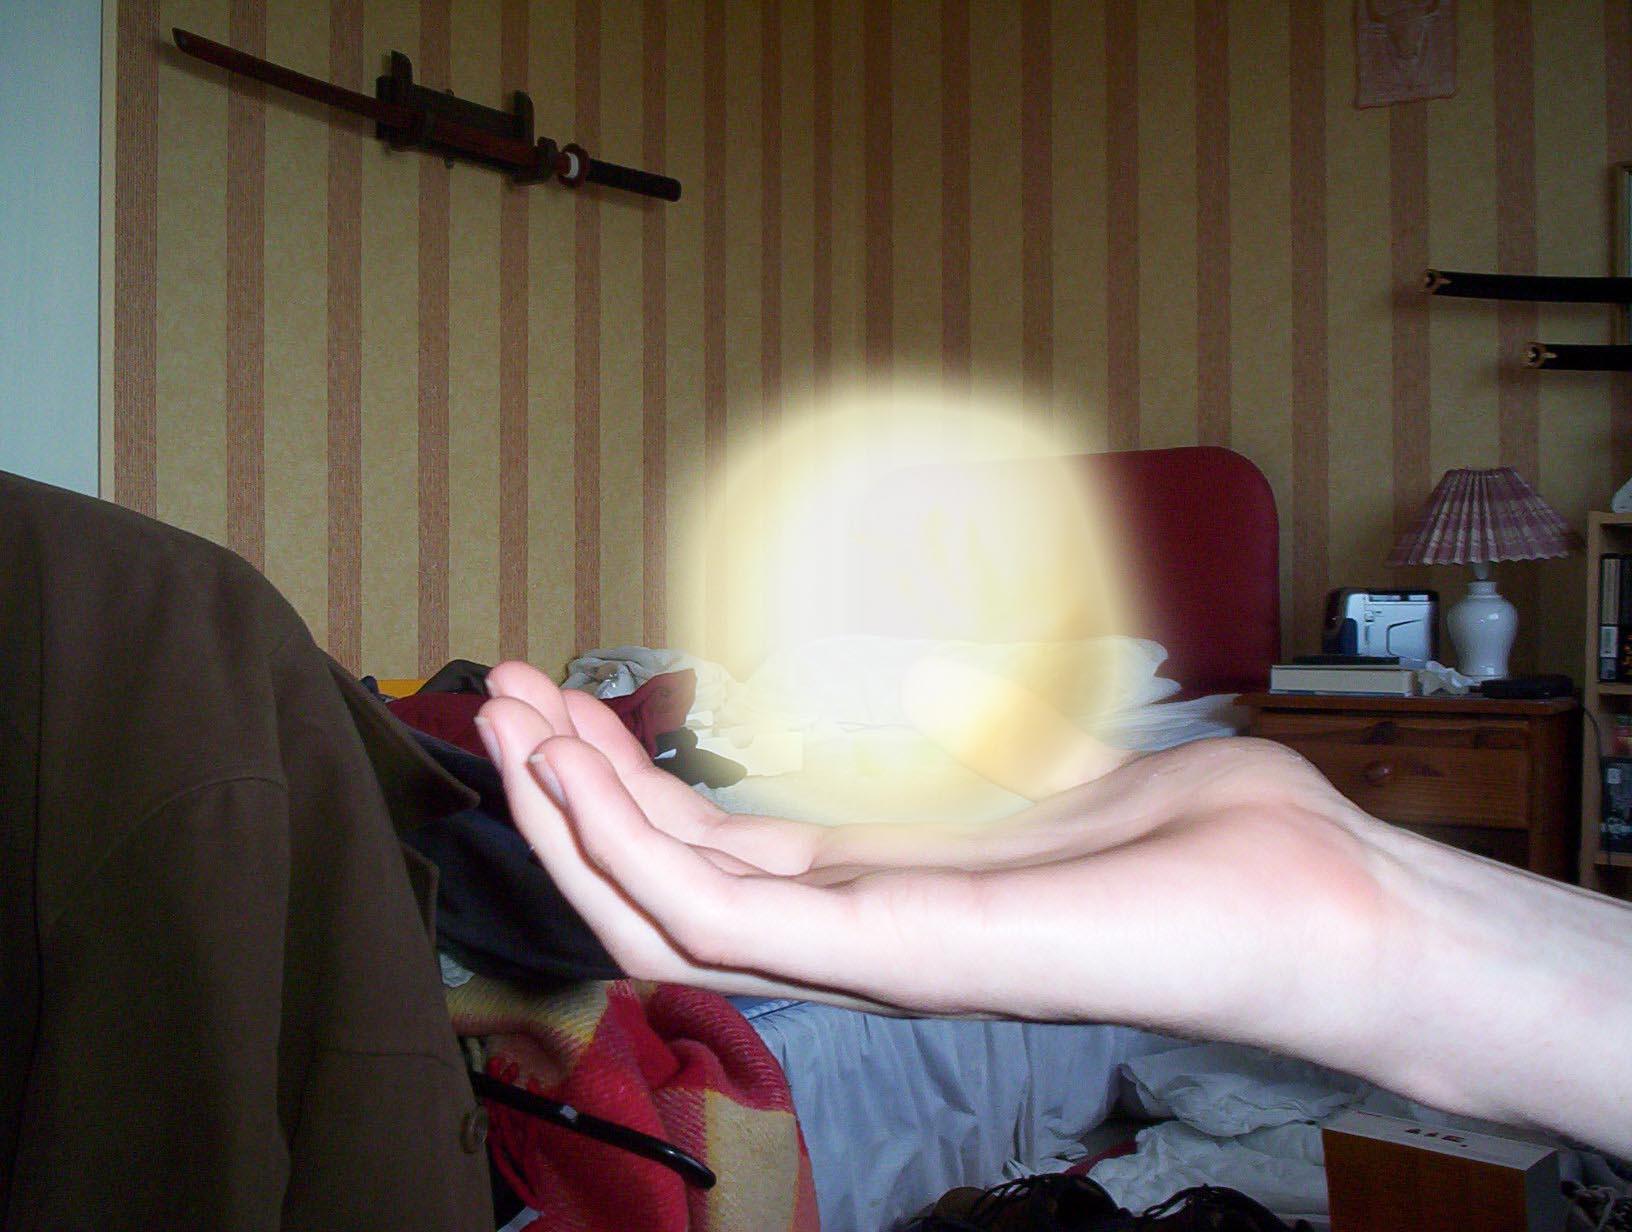 Psi-Ball - Complete by katarn on DeviantArt: katarn.deviantart.com/art/Psi-Ball-Complete-2595415